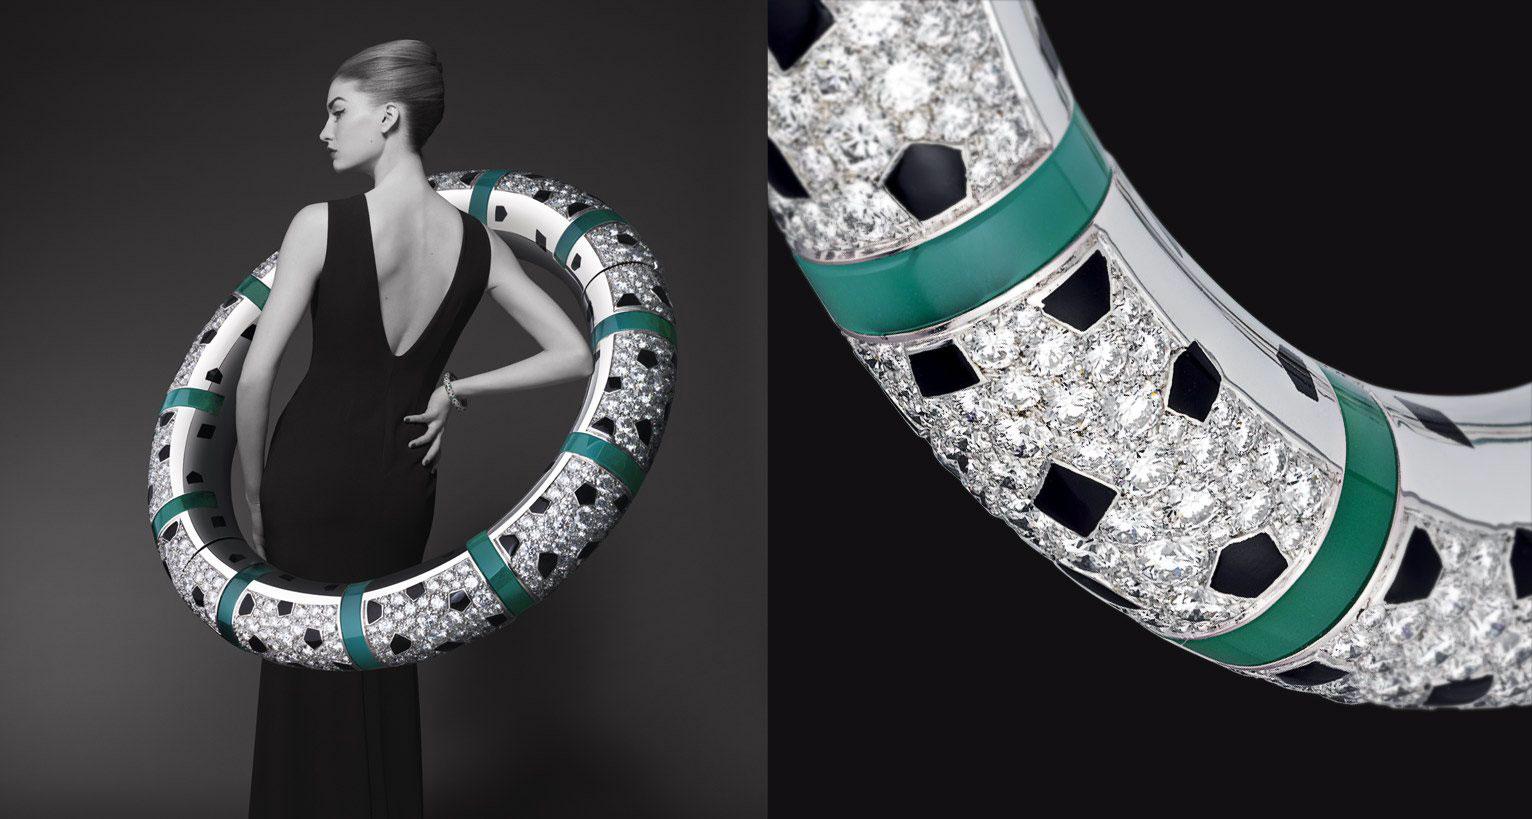 Bracelet in white gold, onyx, black laquer, chrysoprase, diamonds.